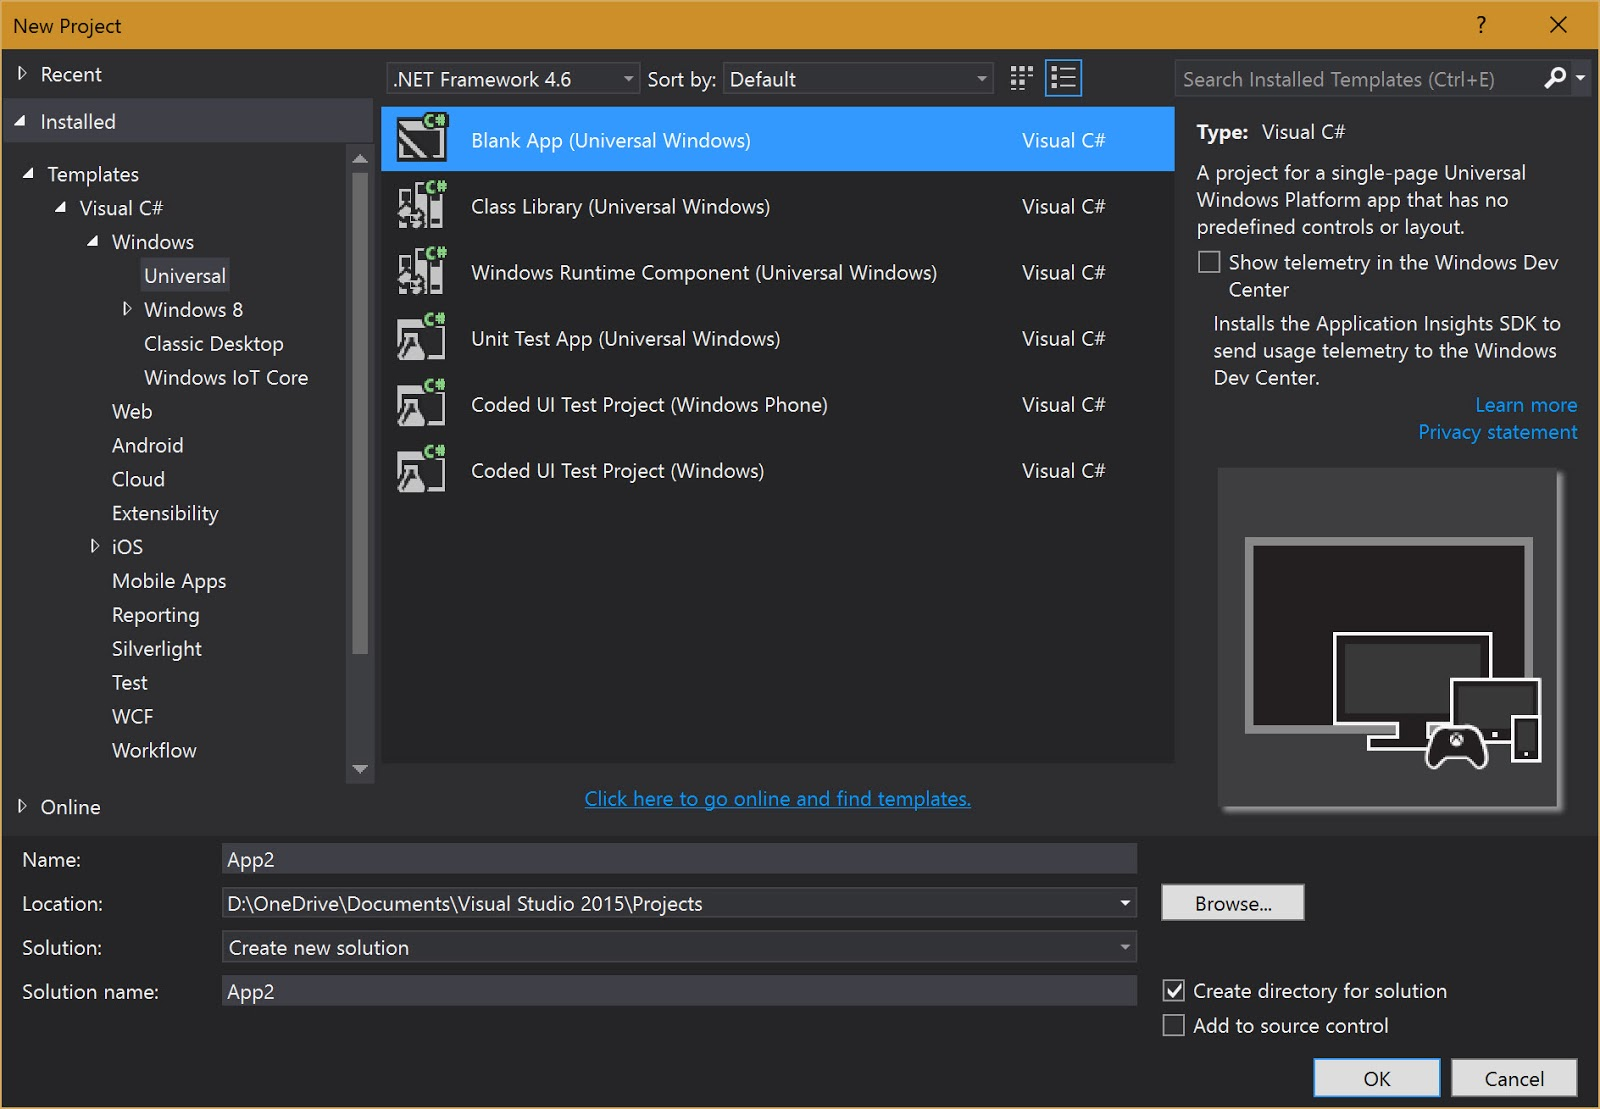 Windows 10 iot core dashboard raspberry pi 3 download